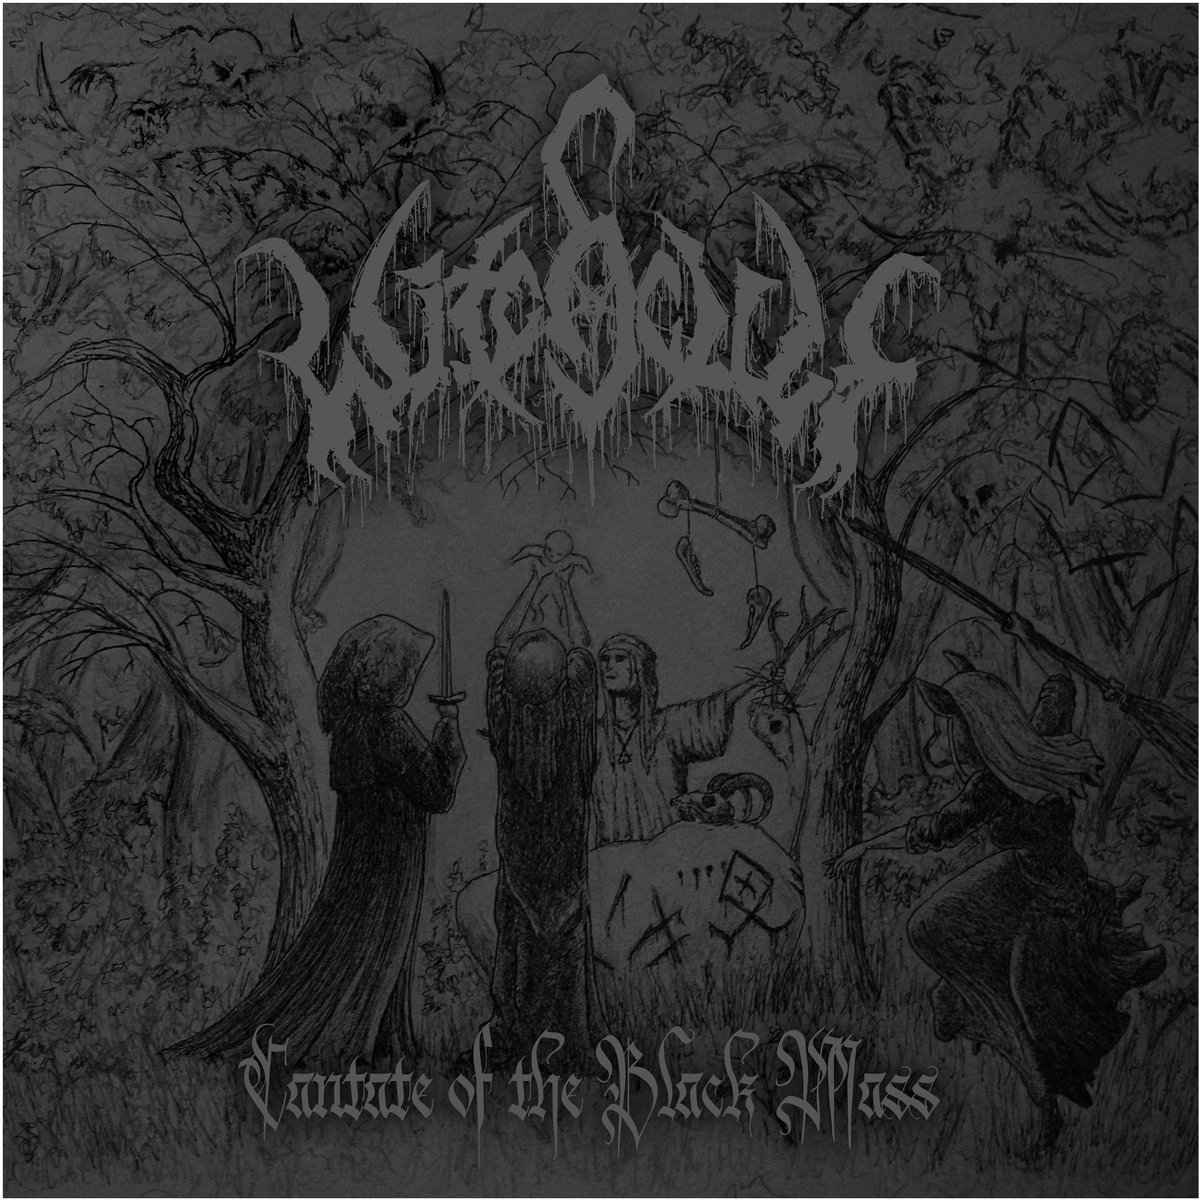 Witchcult - sacrificial black hymns